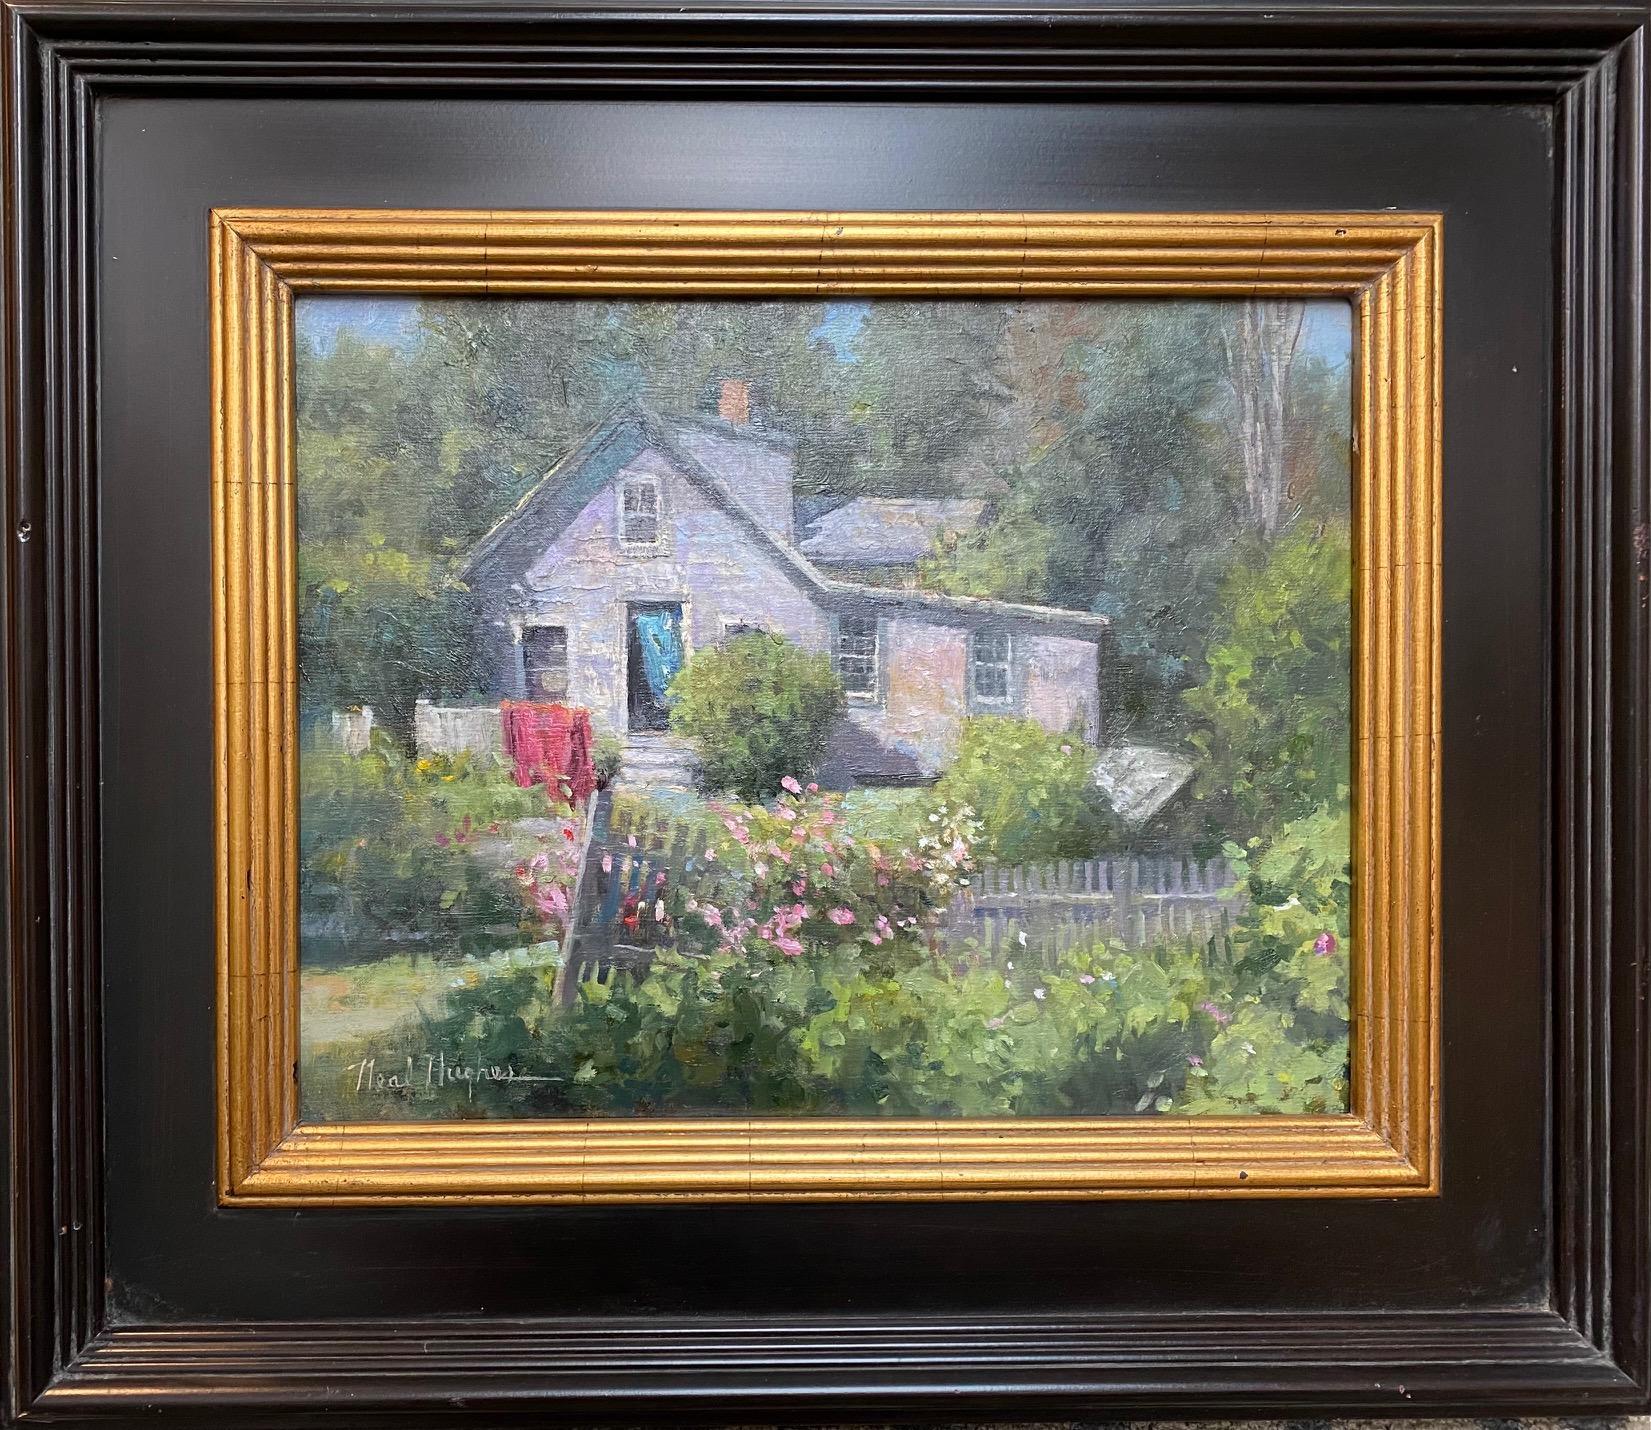 Monhegan Cottage, Maine, original marine landscape oil painting